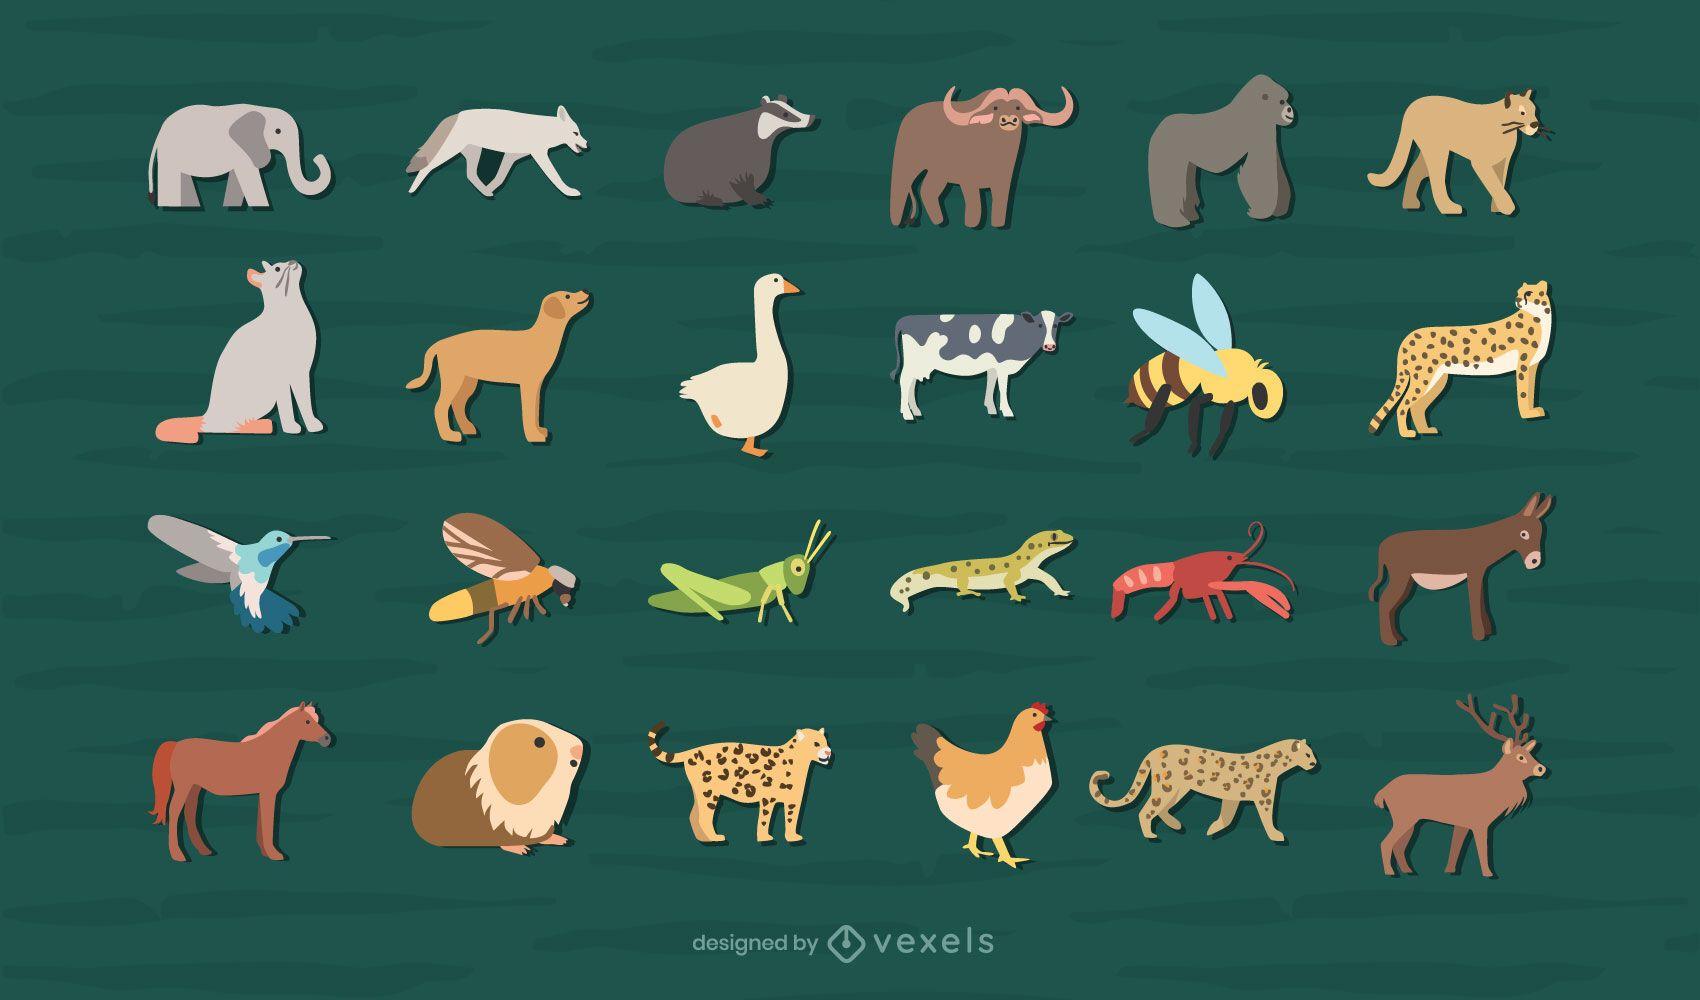 Flat animals design collection